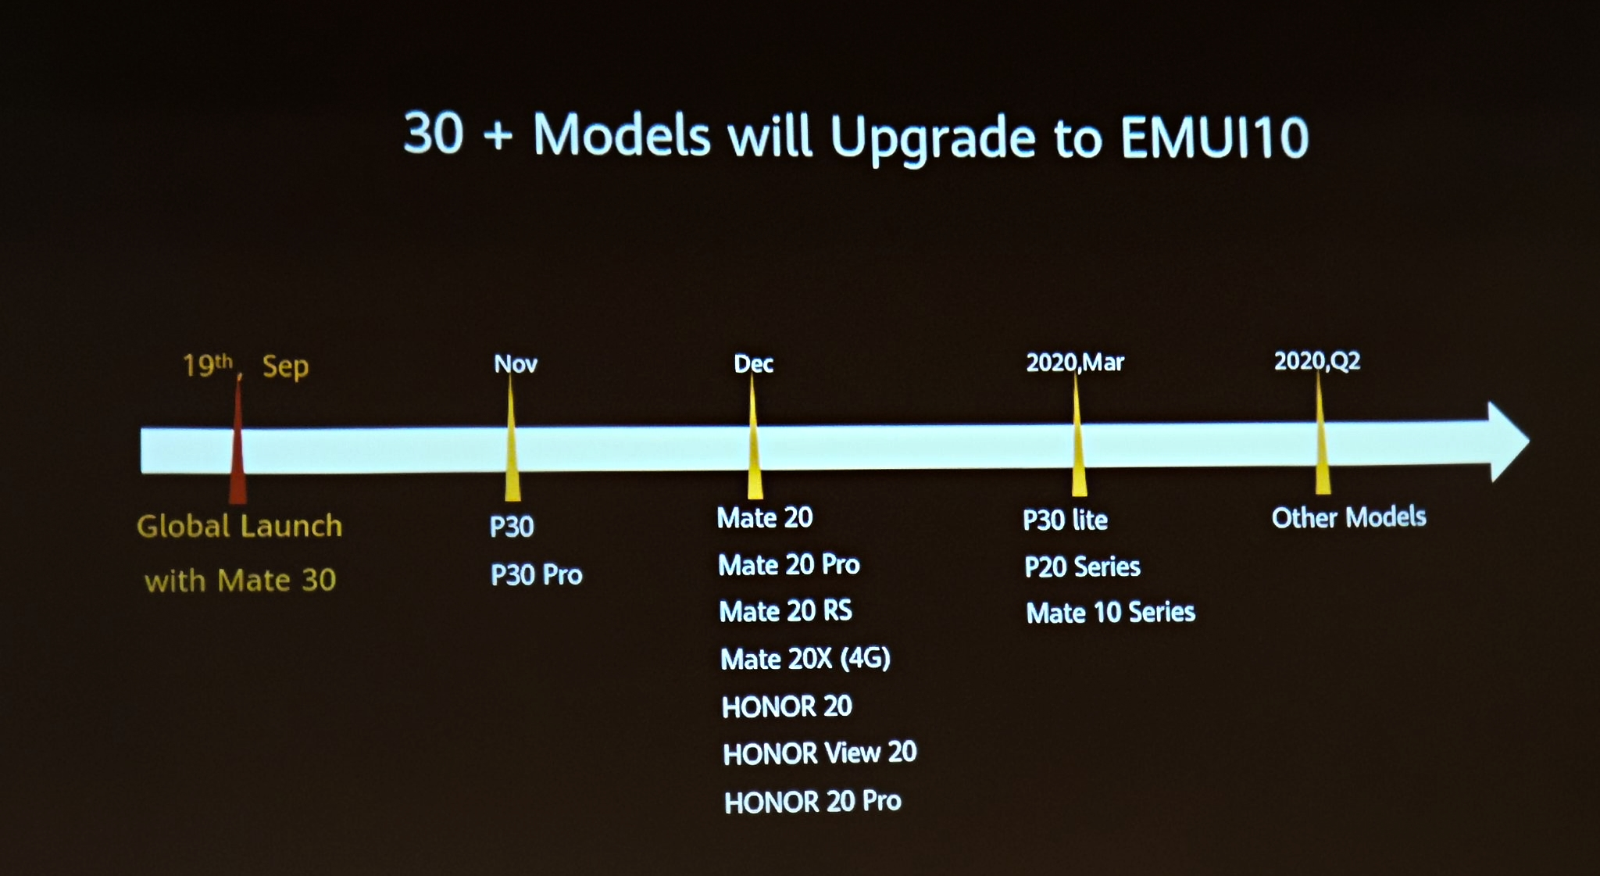 Huawei Emui 10 Roadmap